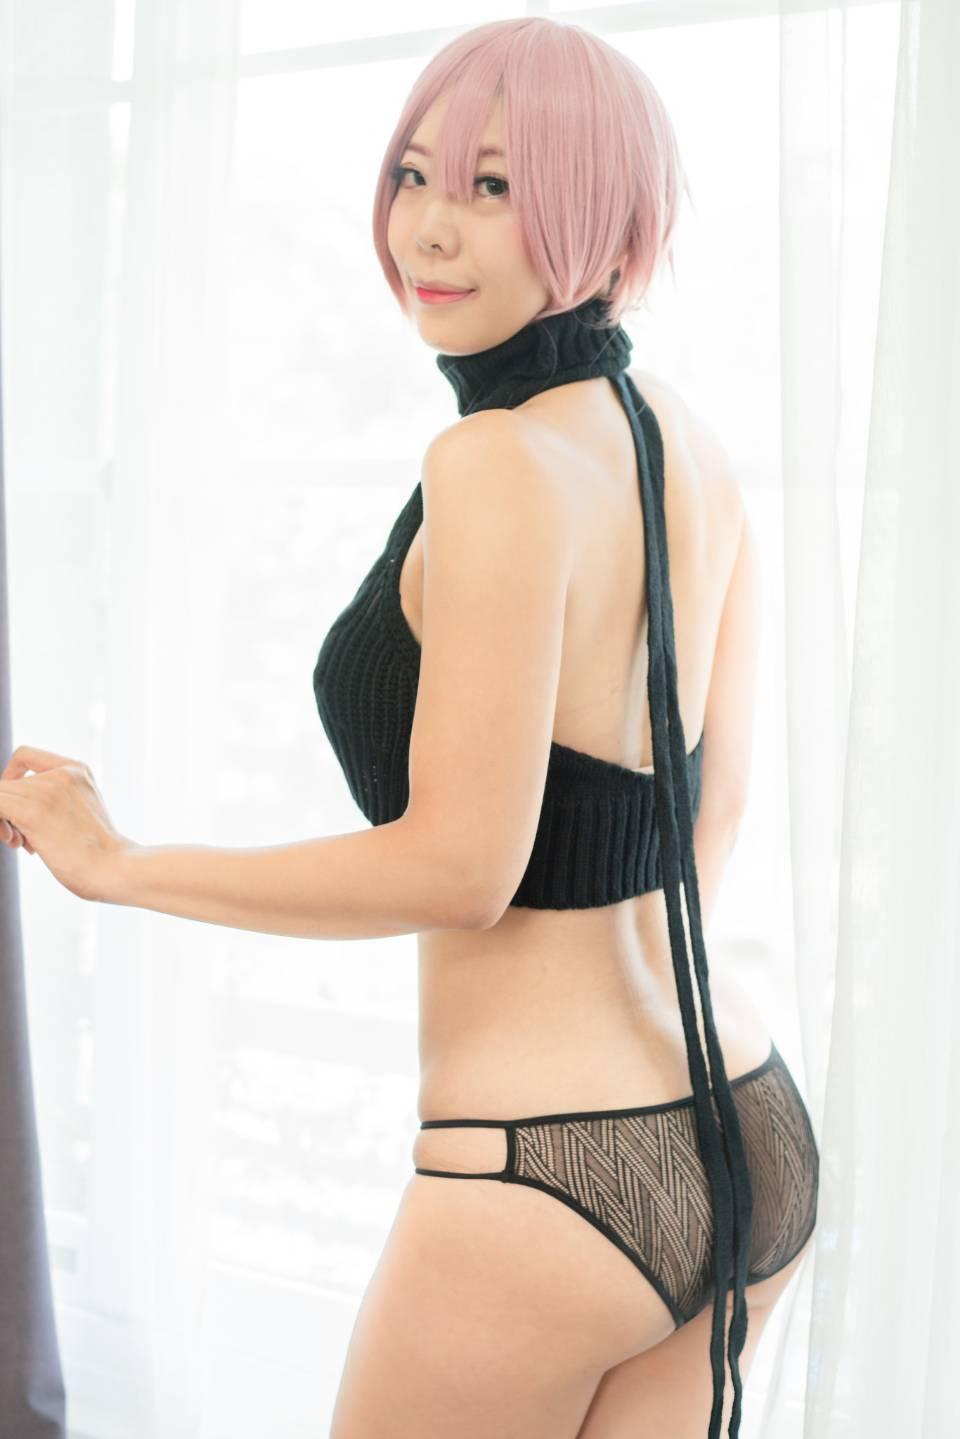 A young and sexy asian woman weared black bikini